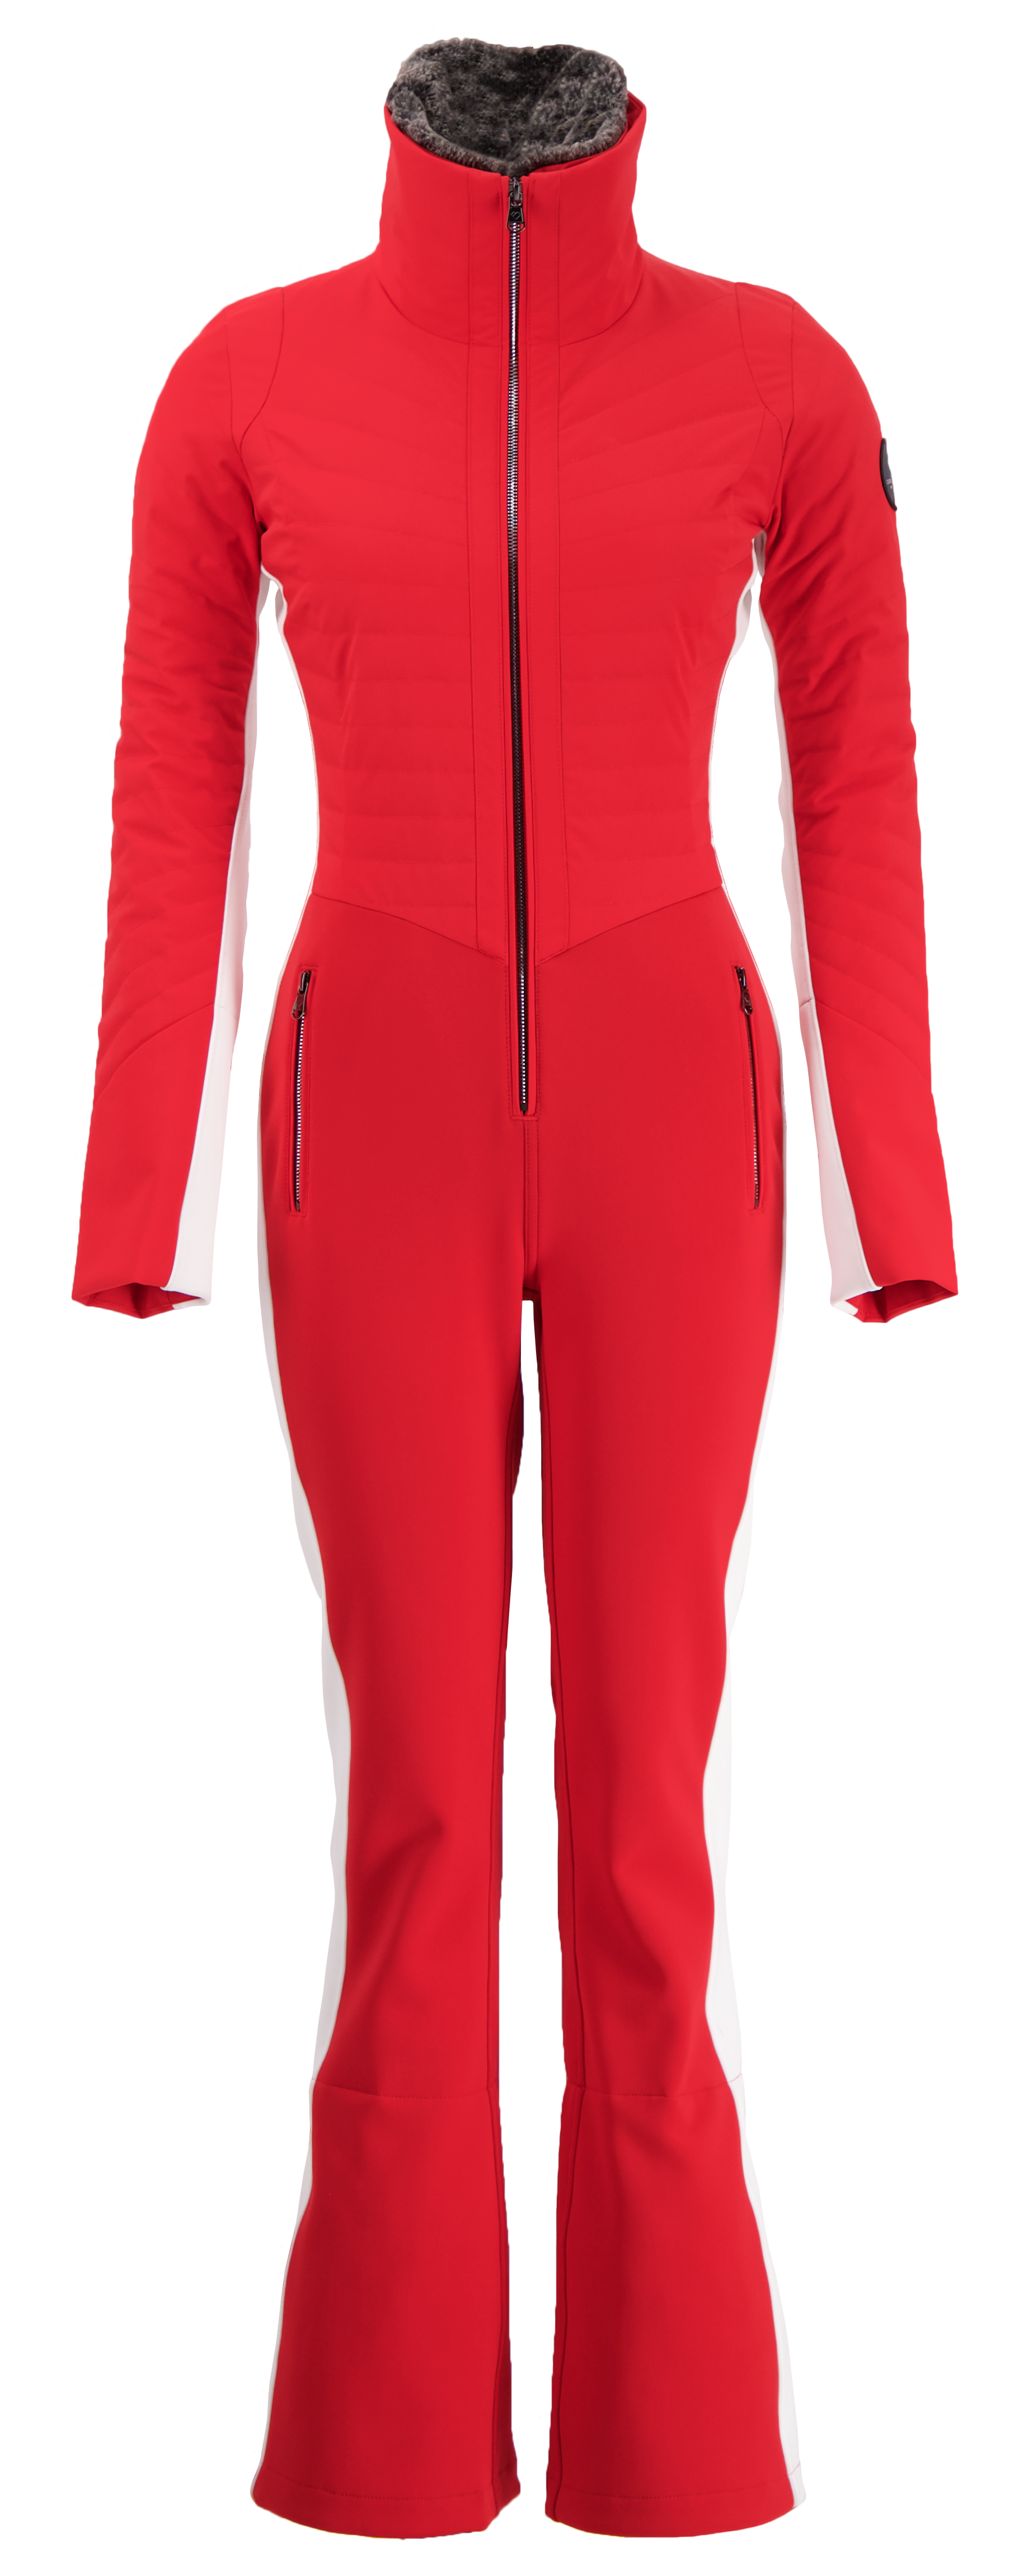 Skier in C0lumbia Heated Vest